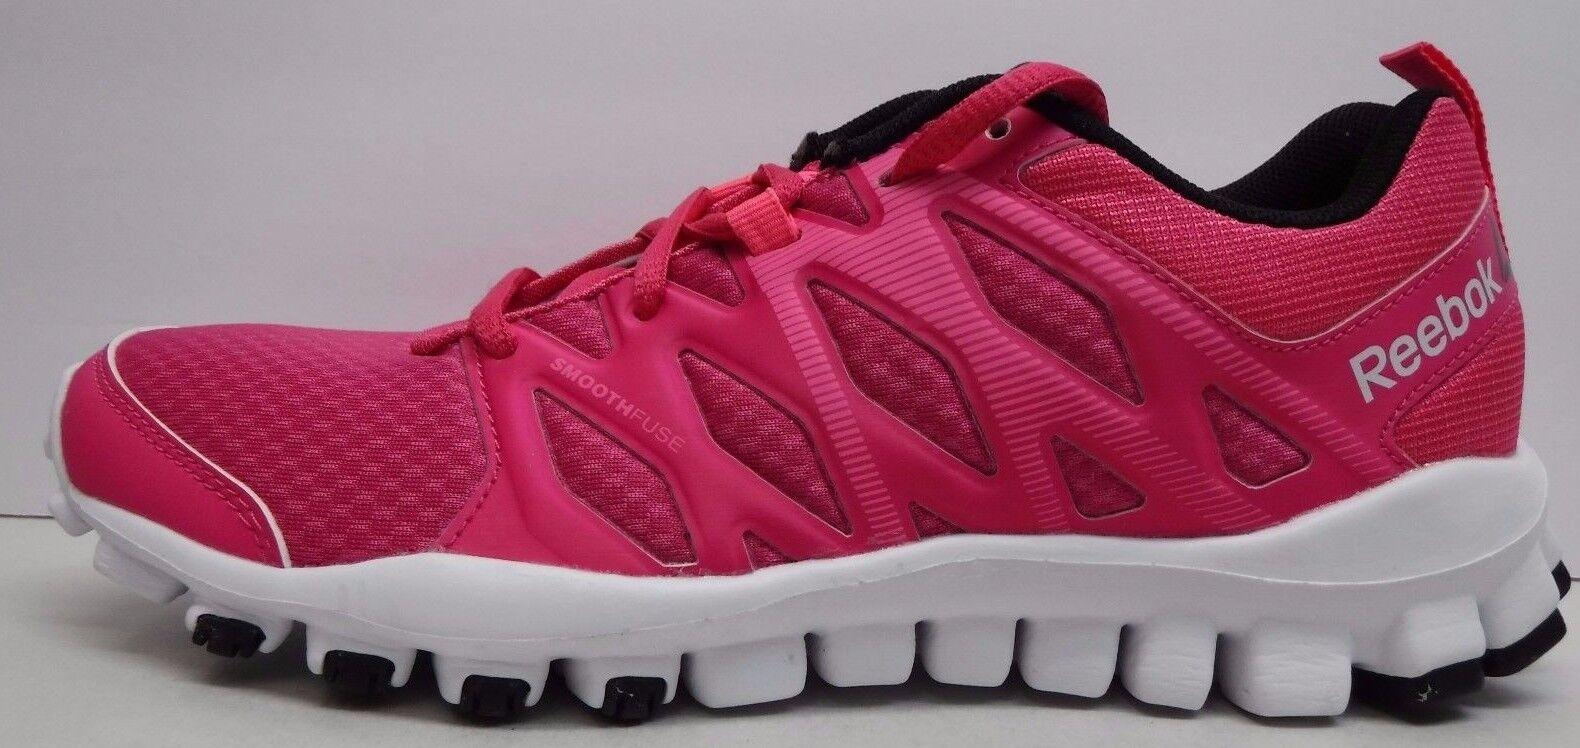 Reebok Training Größe 8.5 RealFlex 4.0 Pink Training Reebok Sneakers New Damenschuhe Schuhes dd3c37